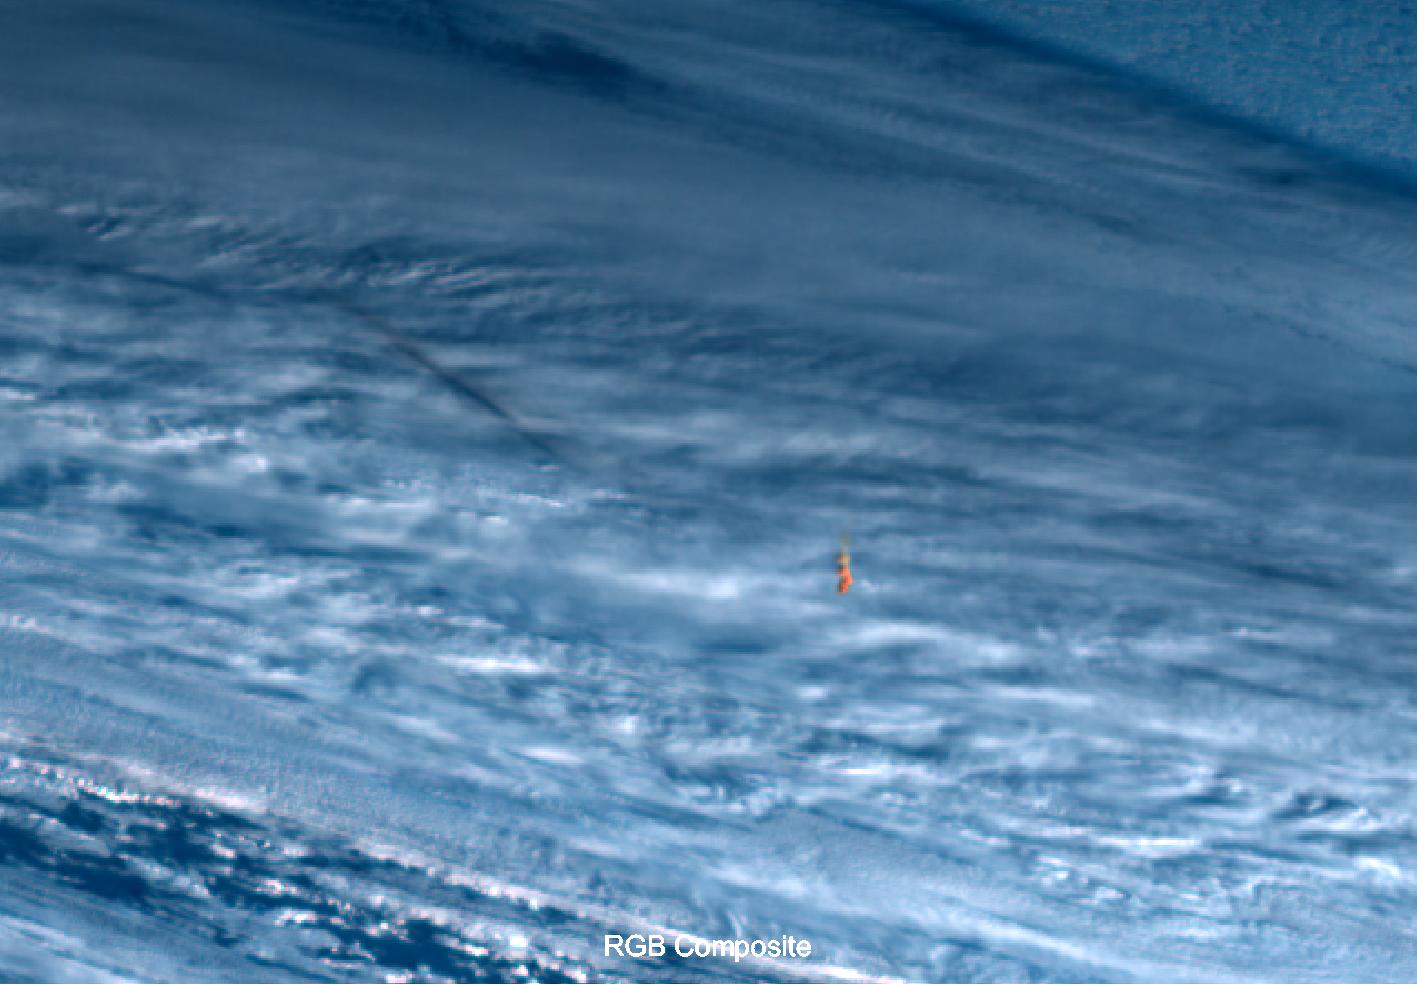 Himawari-8 HRV composite, 18 December, 23:50 UTC ans 19 December 00:00 UTC